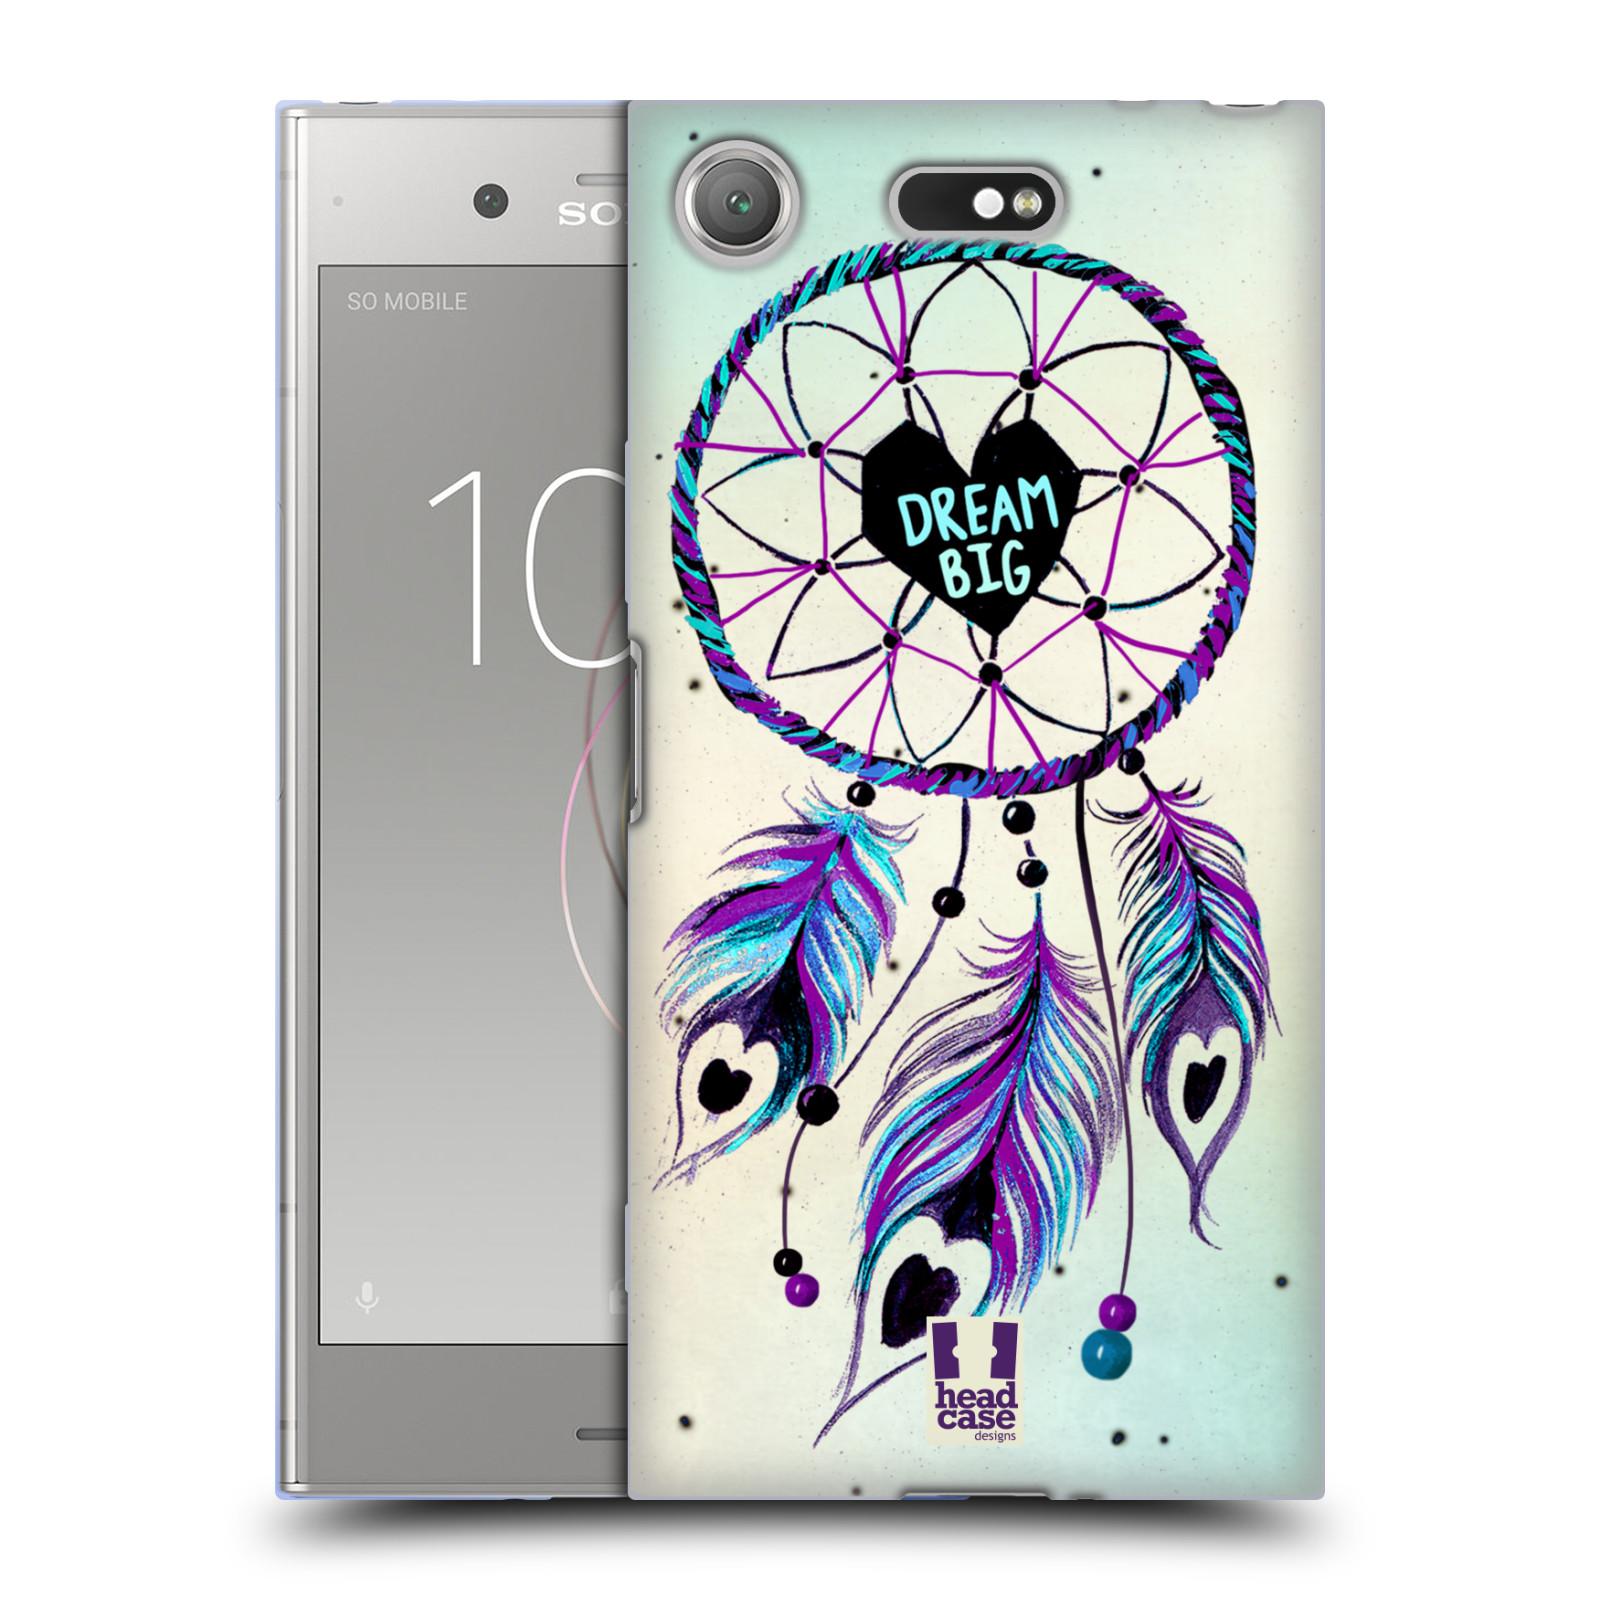 Silikonové pouzdro na mobil Sony Xperia XZ1 Compact - Head Case - Lapač Assorted Dream Big Srdce